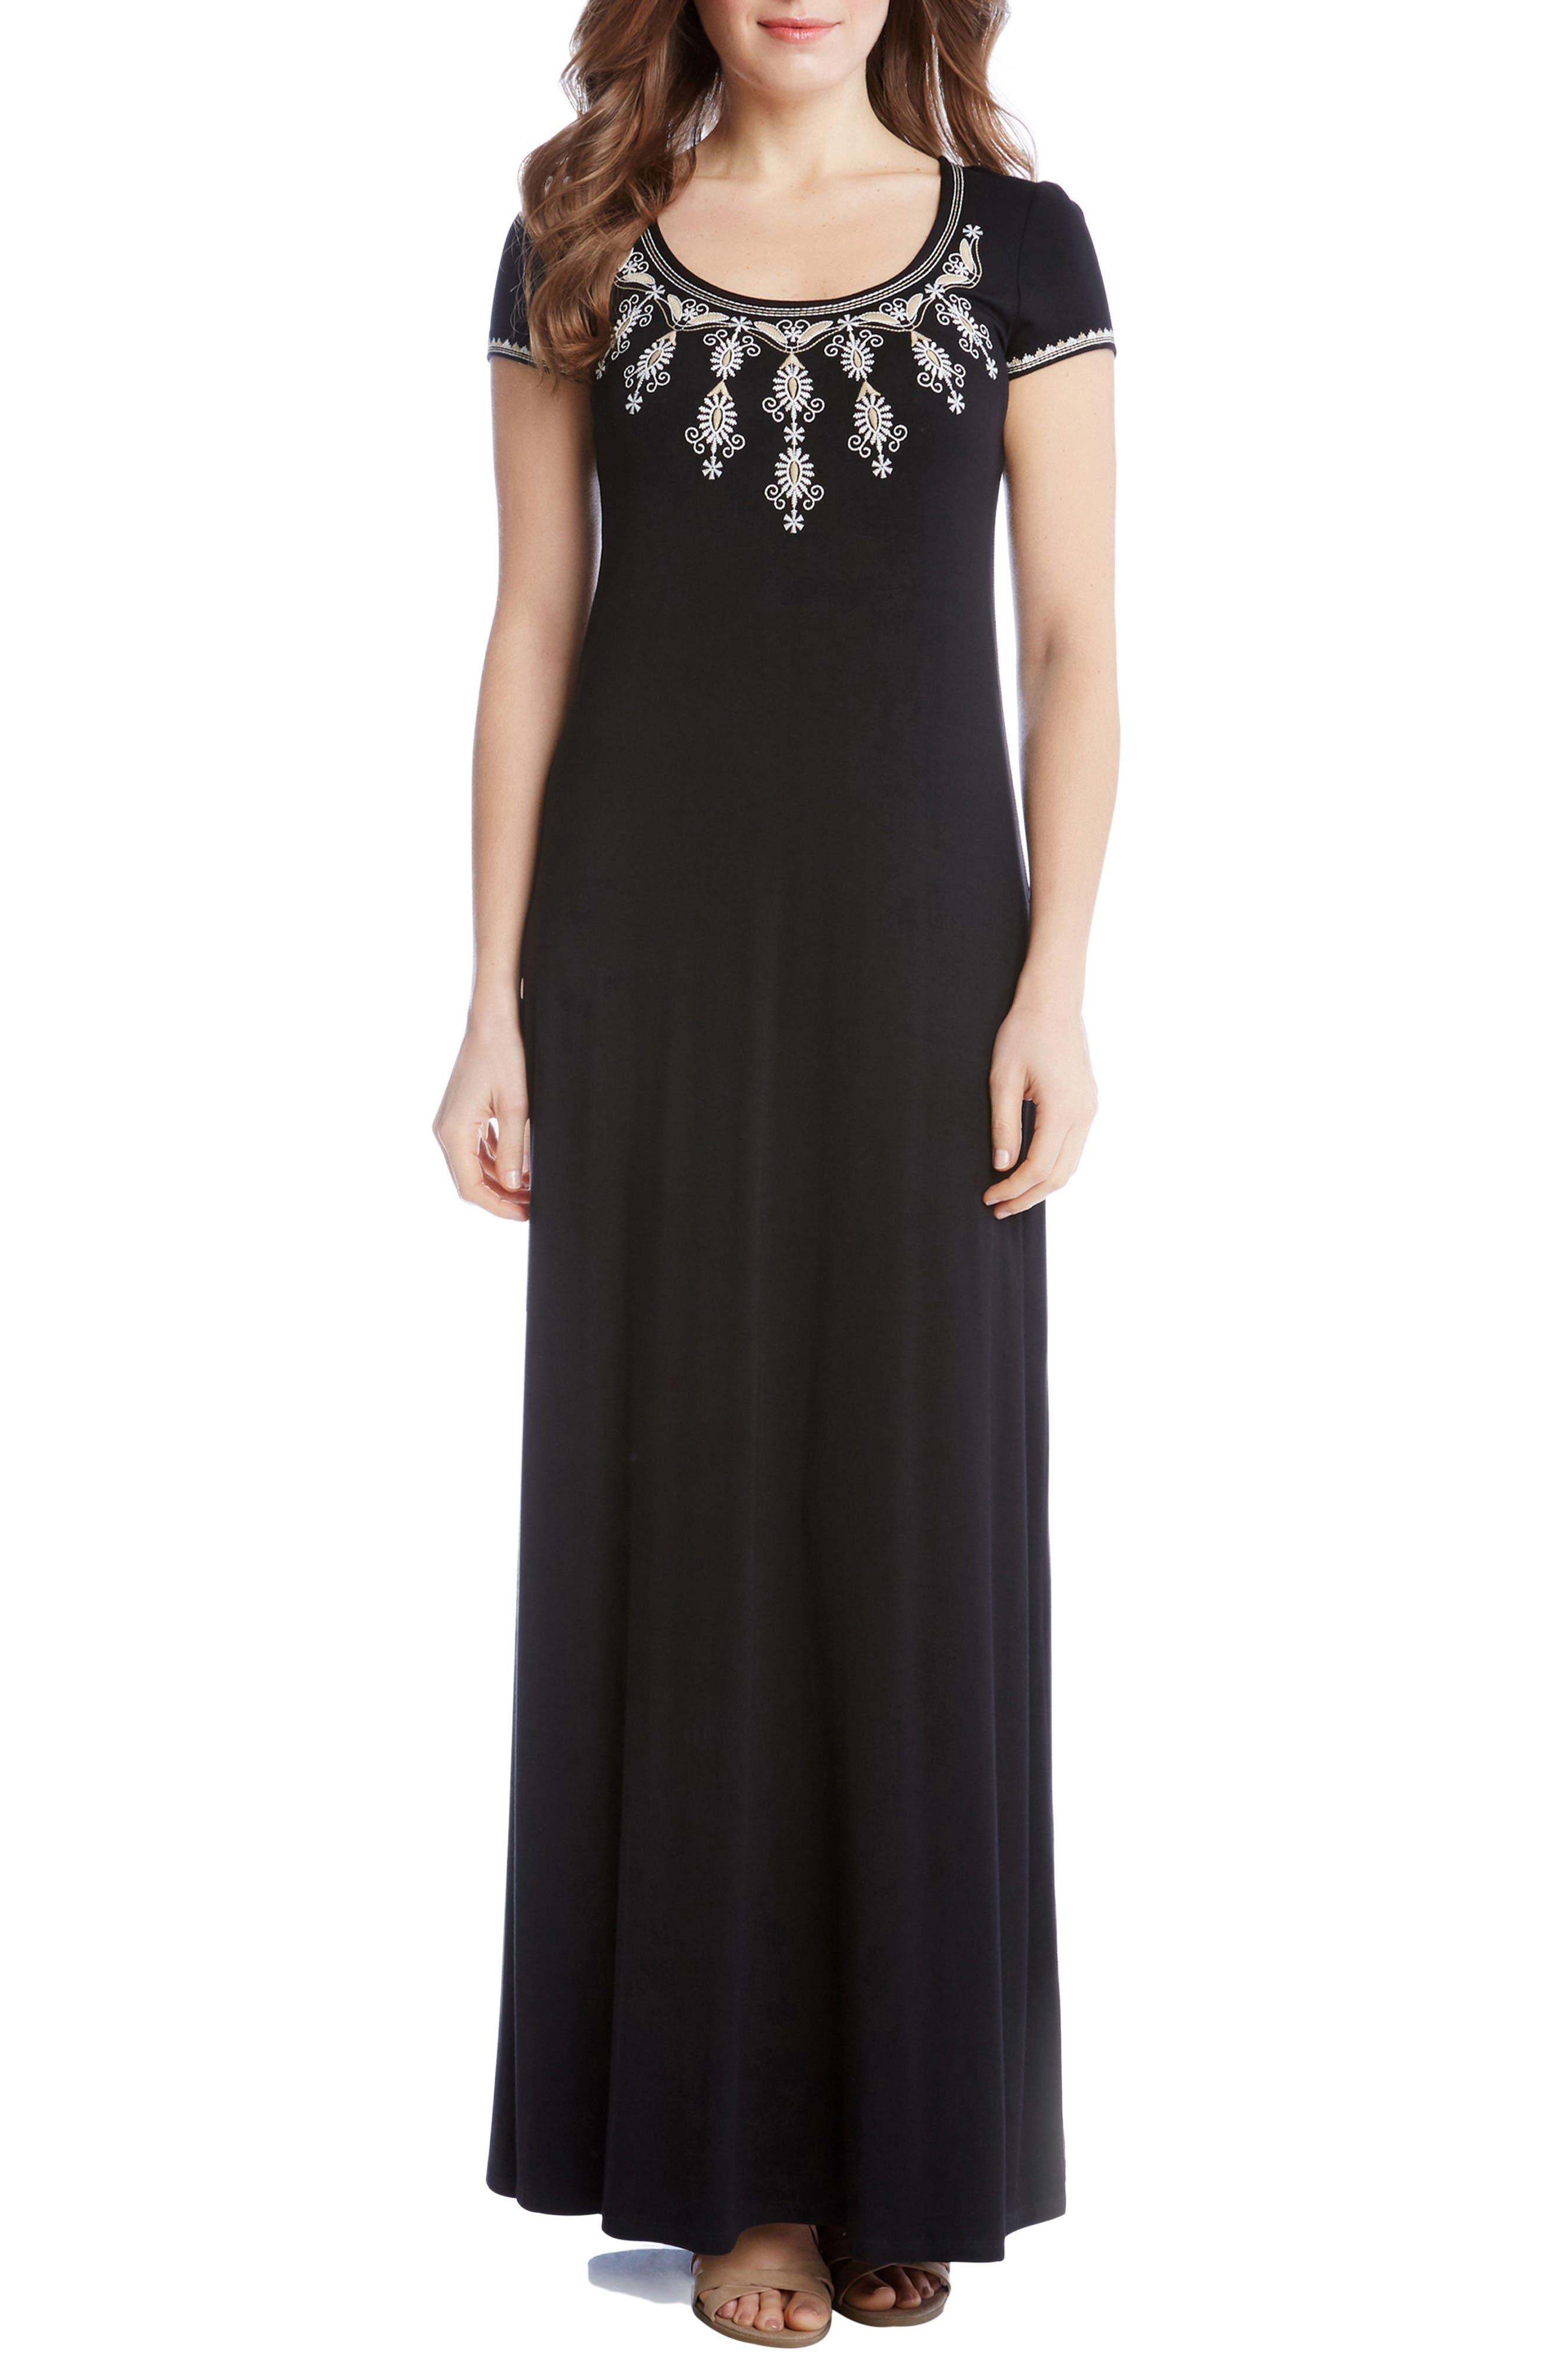 Alternate Image 1 Selected - Karen Kane Embroidered Cap Sleeve Maxi Dress